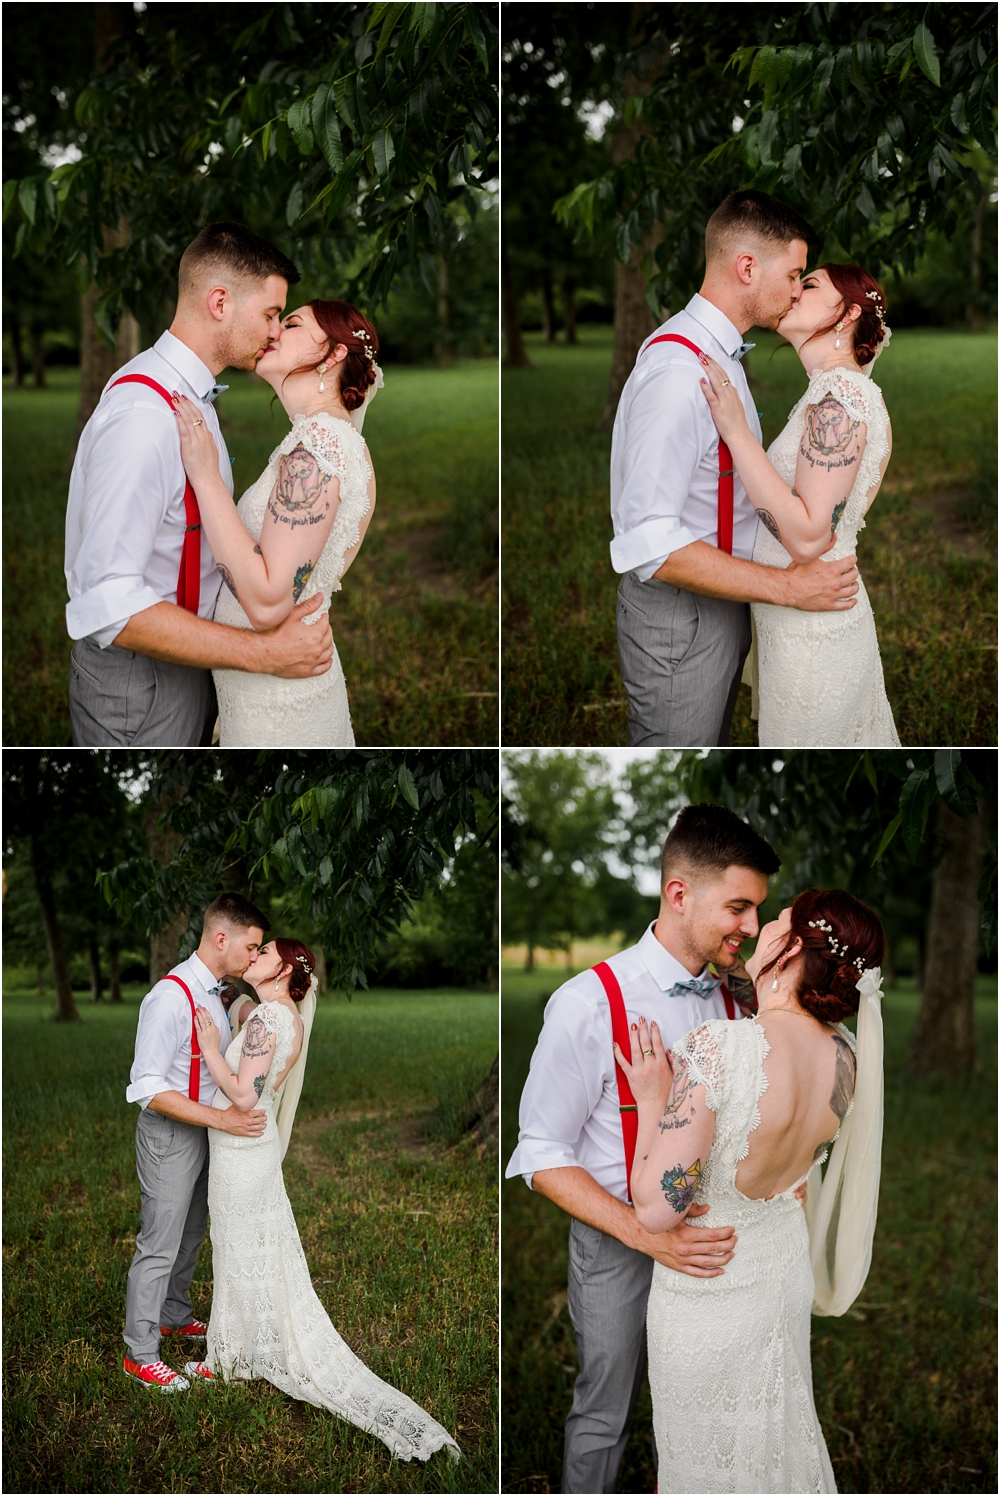 the-barn-at-wateroaks-circus-florida-wedding-photographer-kiersten-stevenson-photography-58.jpg